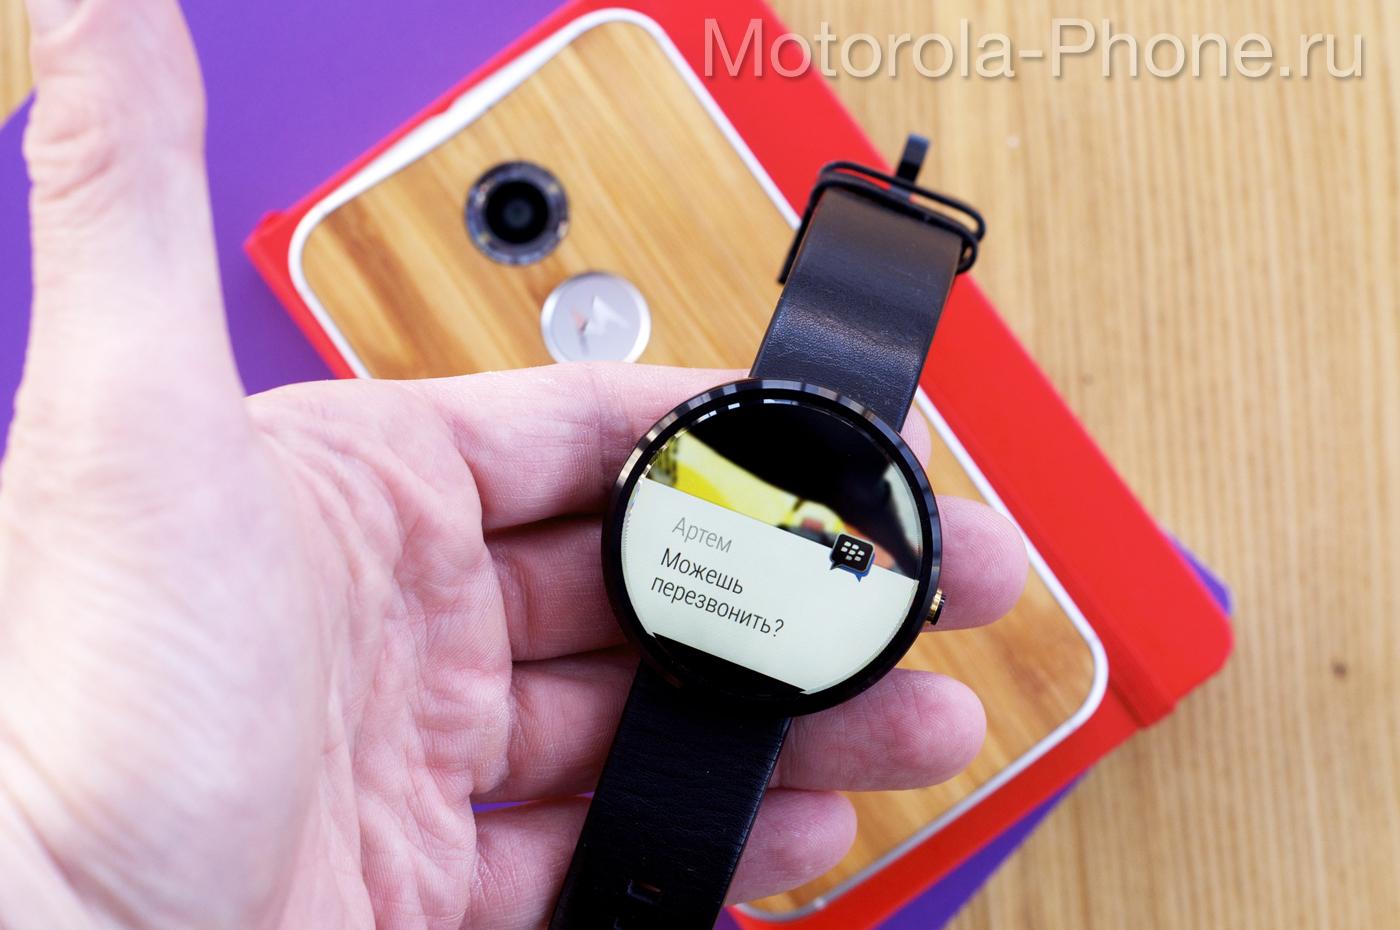 BBM-Android-Wear-Moto-06